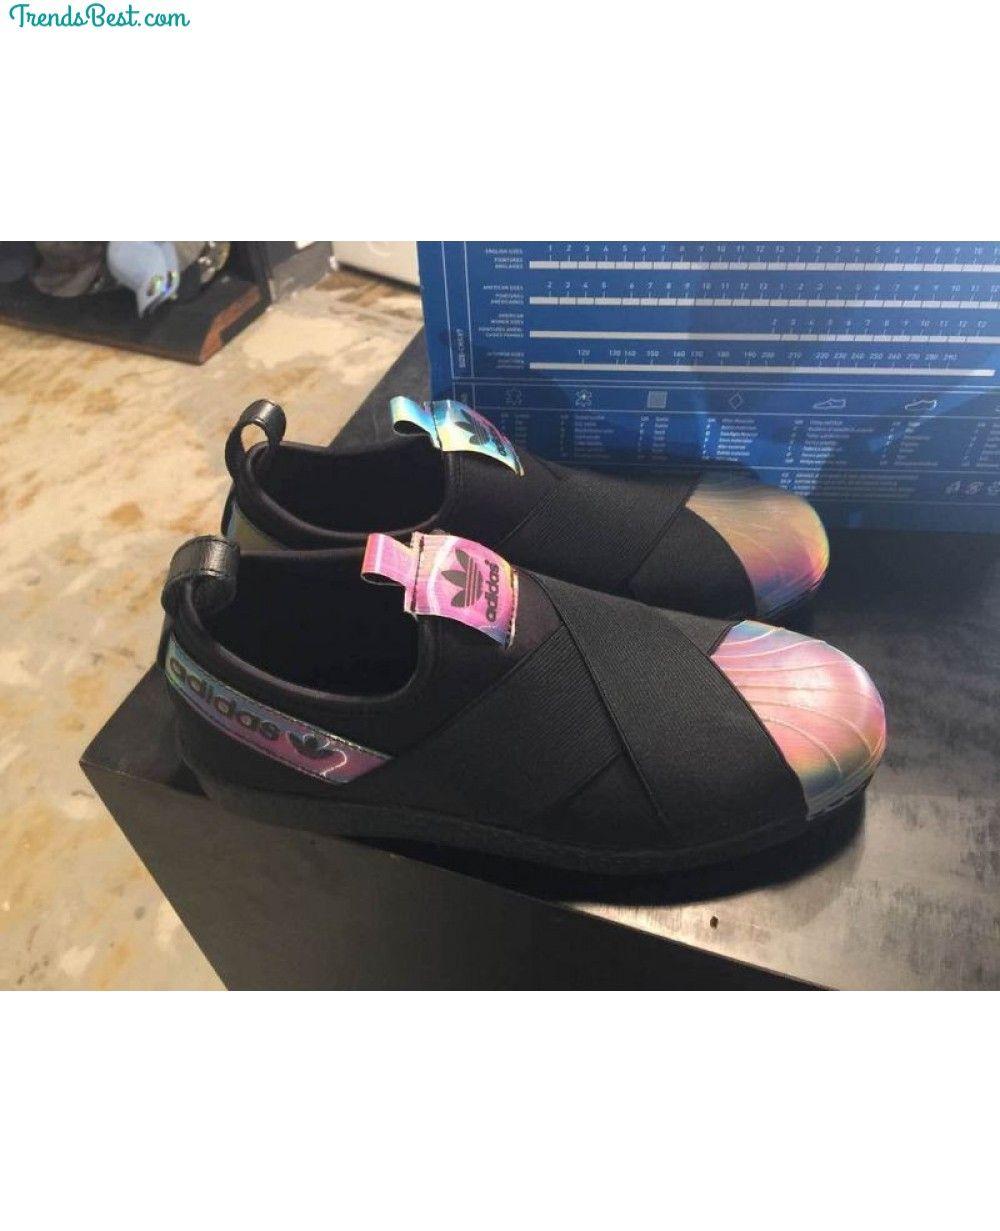 4f6993d27583 Adidas x Rita Ora Superstar Slip On W Black Hologram Iridescent ...